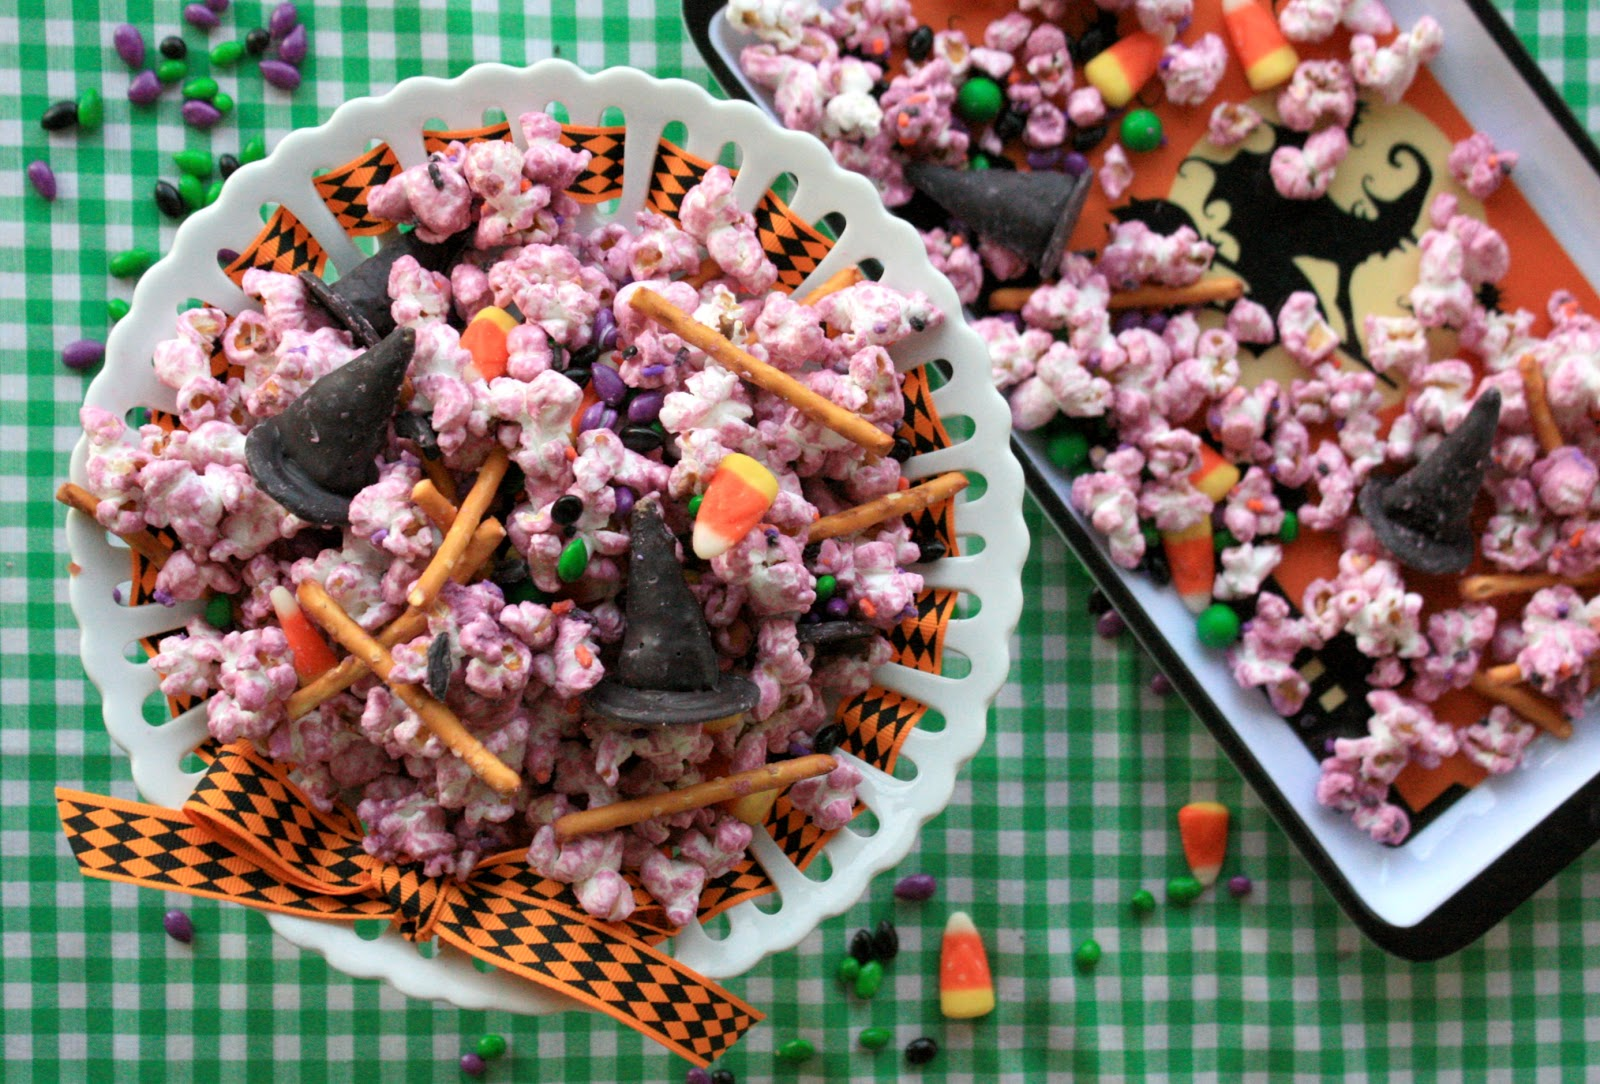 Munchkin Munchies Wicked Witch Popcorn Snack Mix